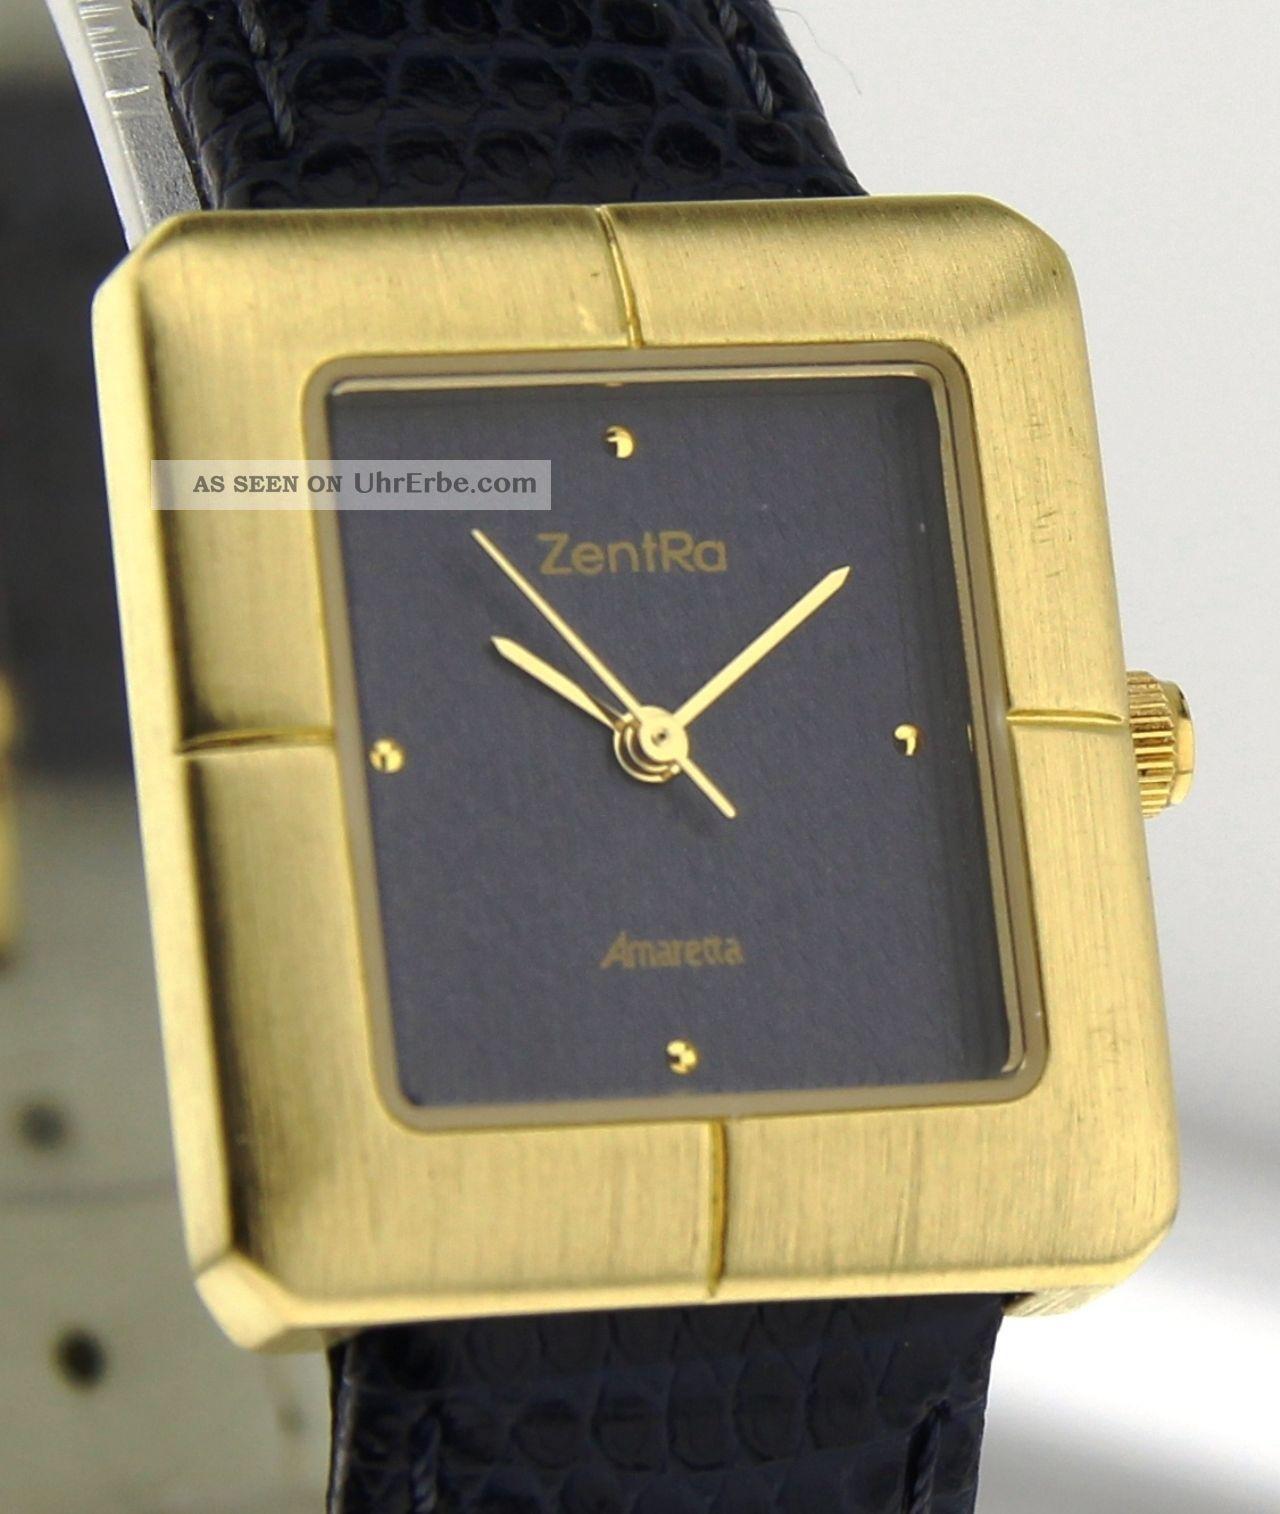 Armbanduhr Zentra Amaretta - Messing - Mineralglas - Mit Lederband Armbanduhren Bild